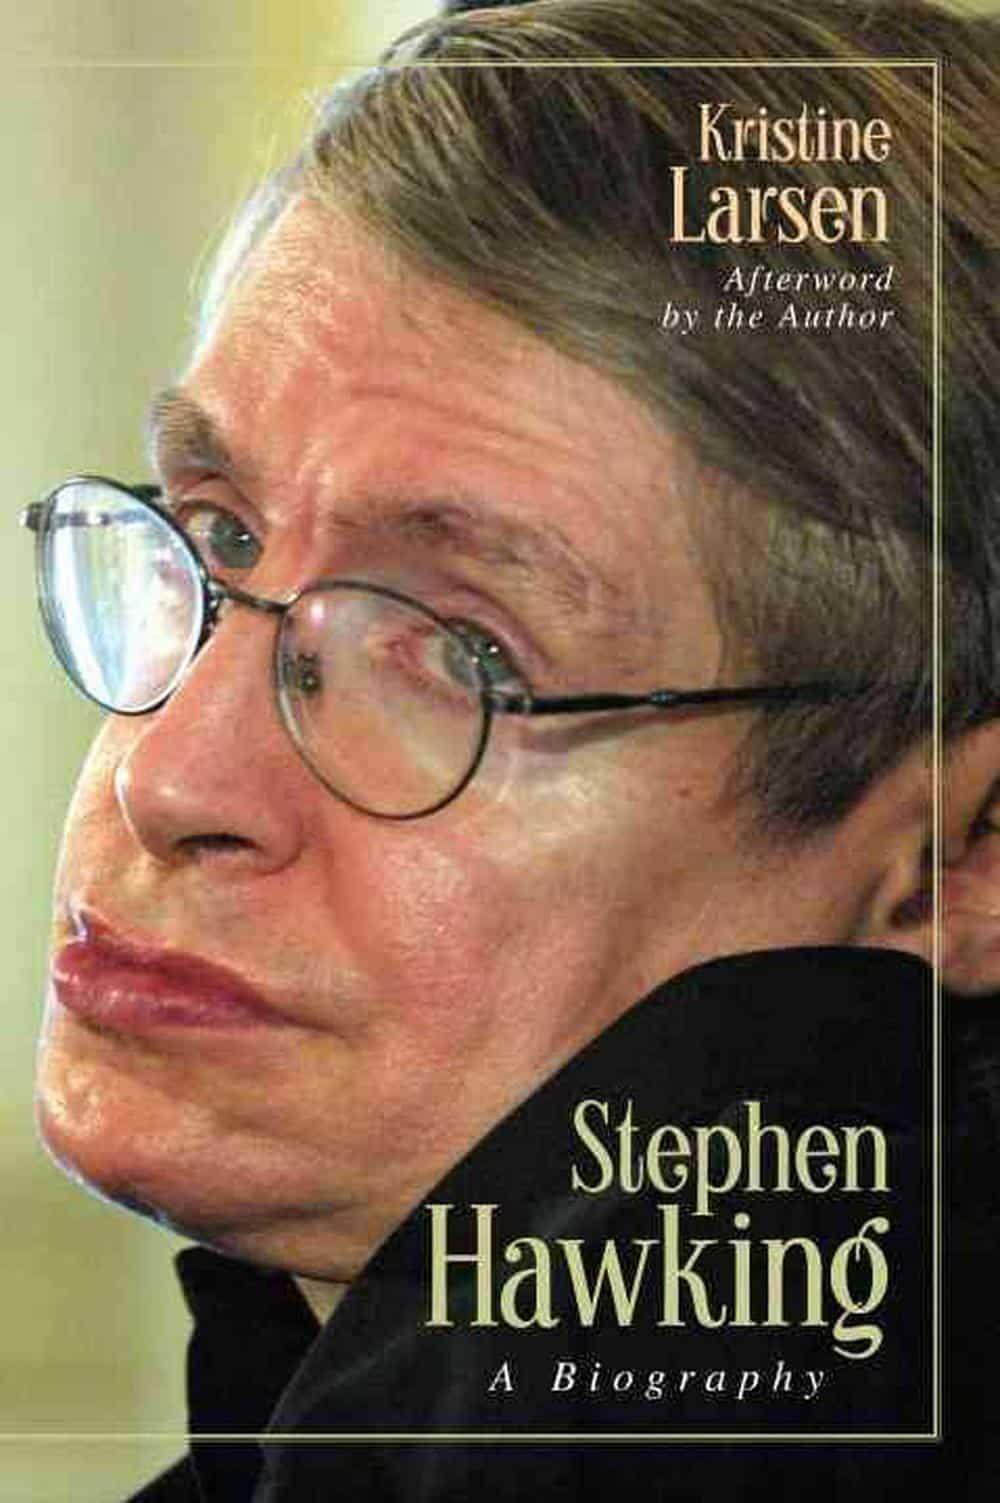 Stephen Hawking - A Biography